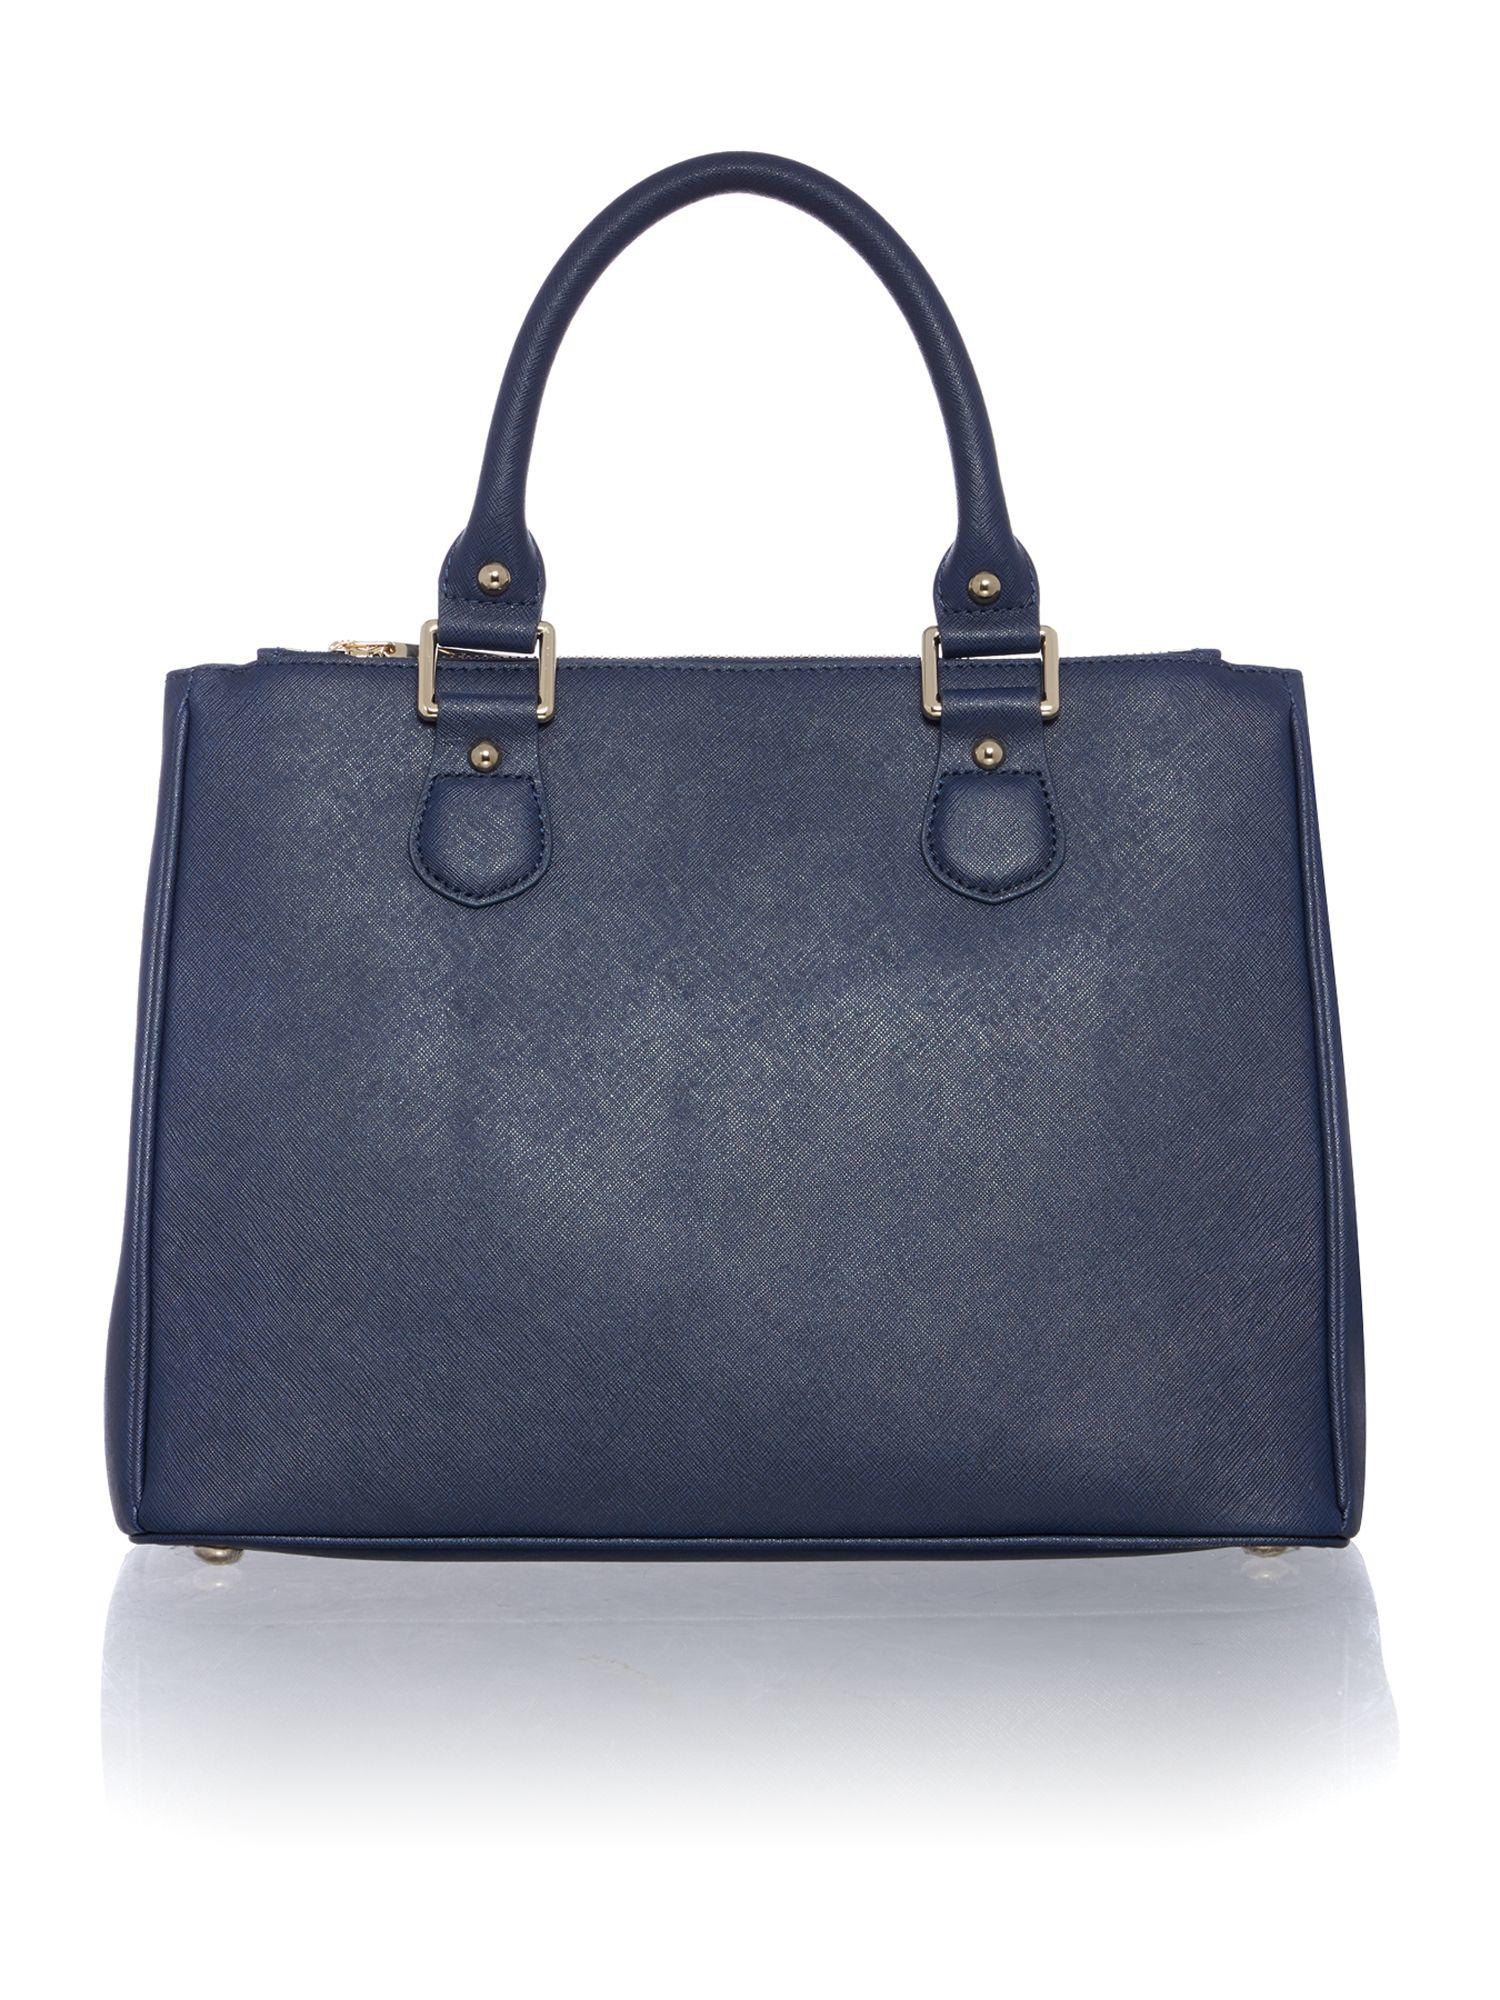 Lamb 1887 Joanna Navy Tote Bag in Blue